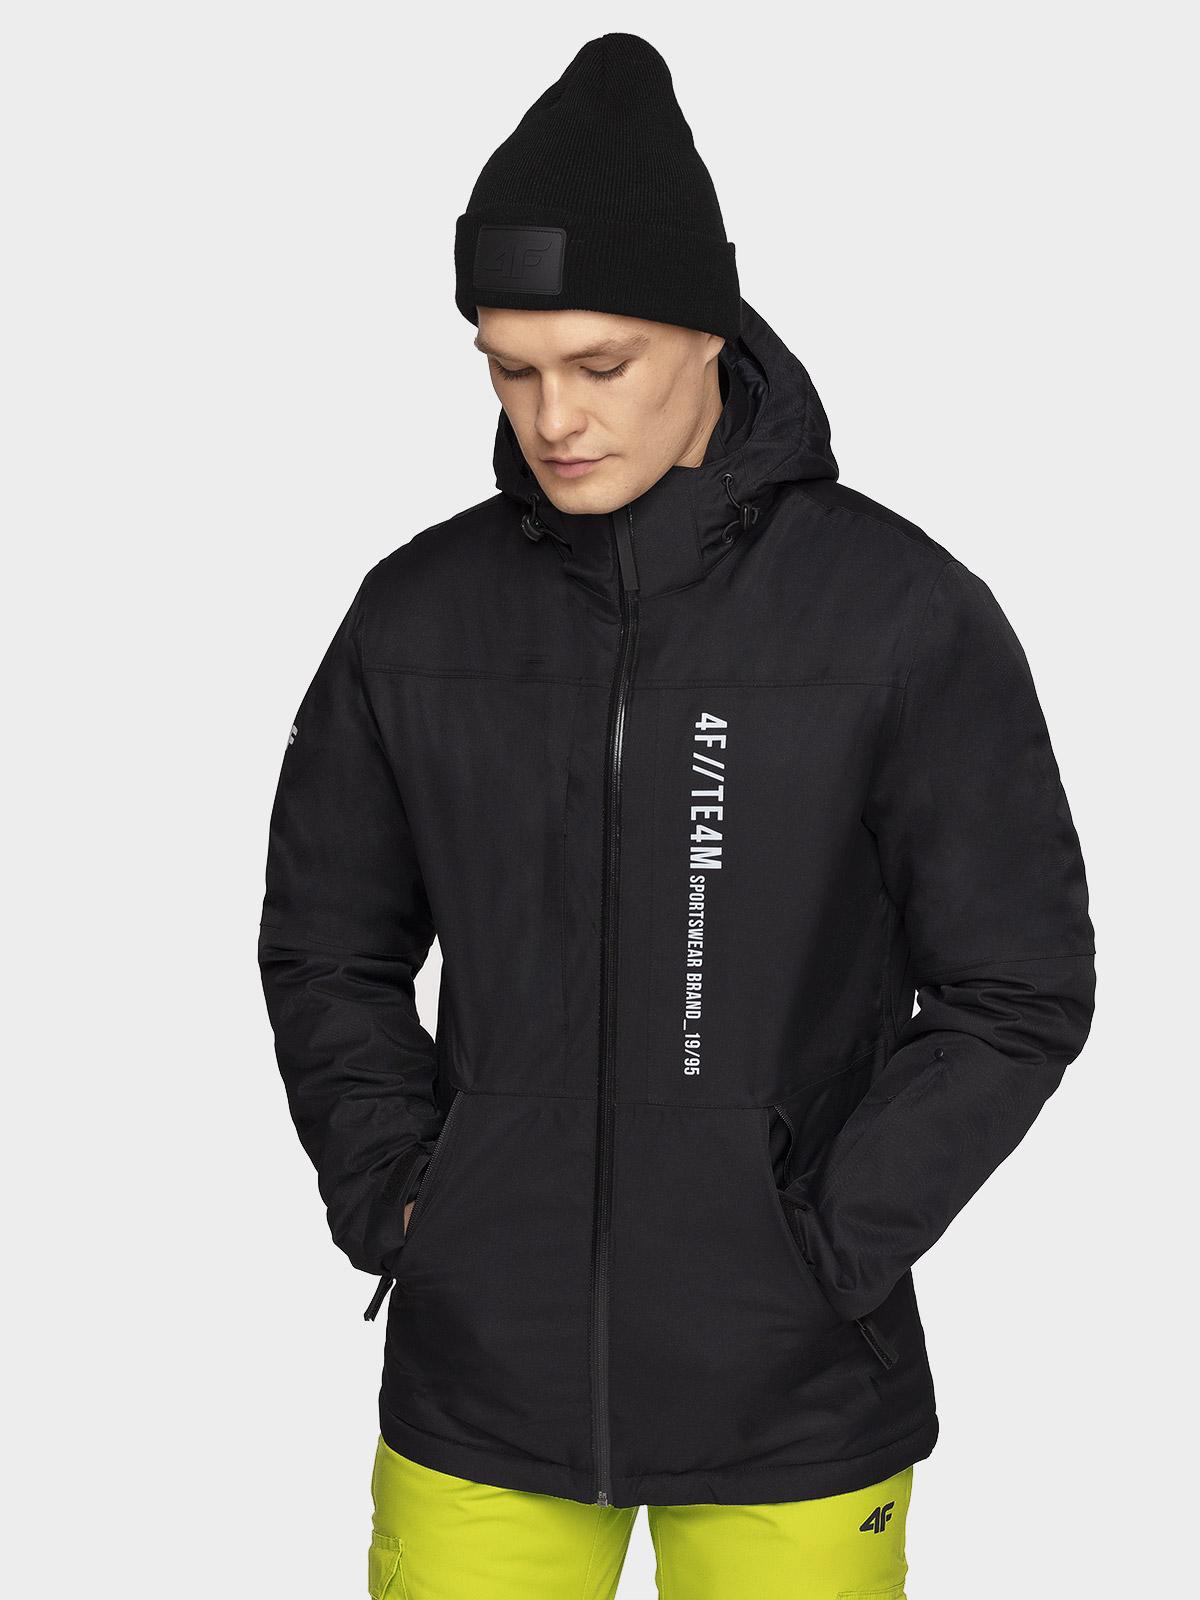 4f kurtka narciarska męska h4z19 kumn073